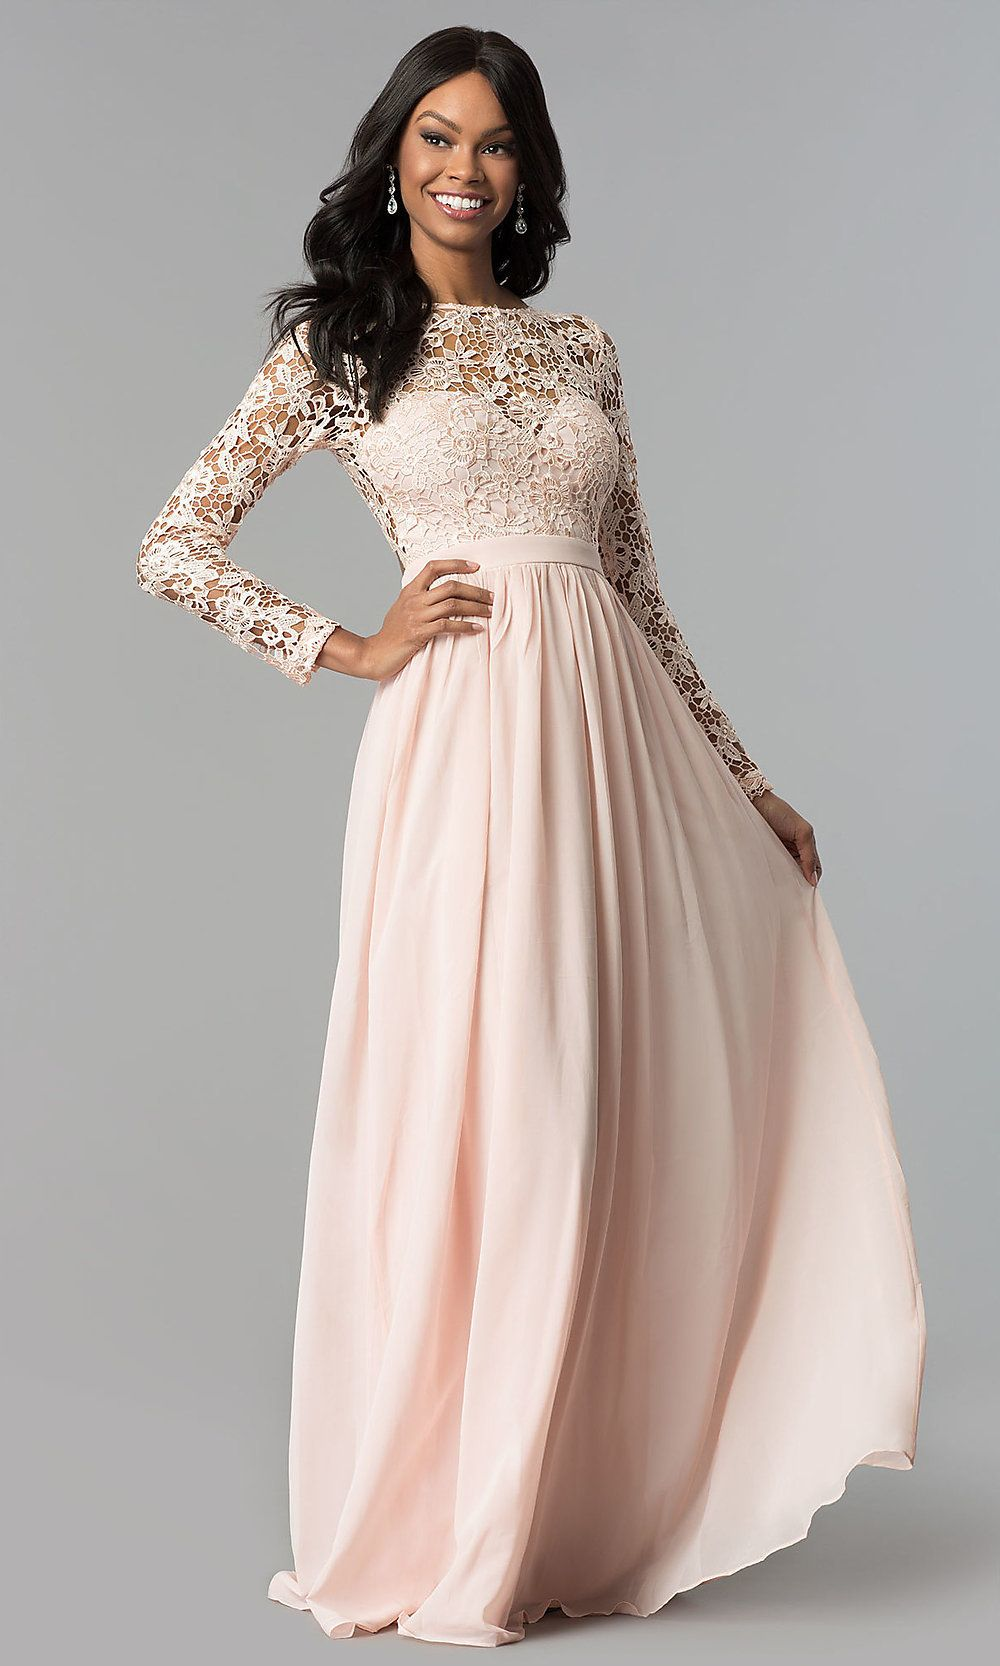 Lace Bodice Long Sleeve Corset Back Prom Dress Long Sleeve Bridesmaid Dress Prom Dresses Long With Sleeves Dresses [ 1666 x 1000 Pixel ]